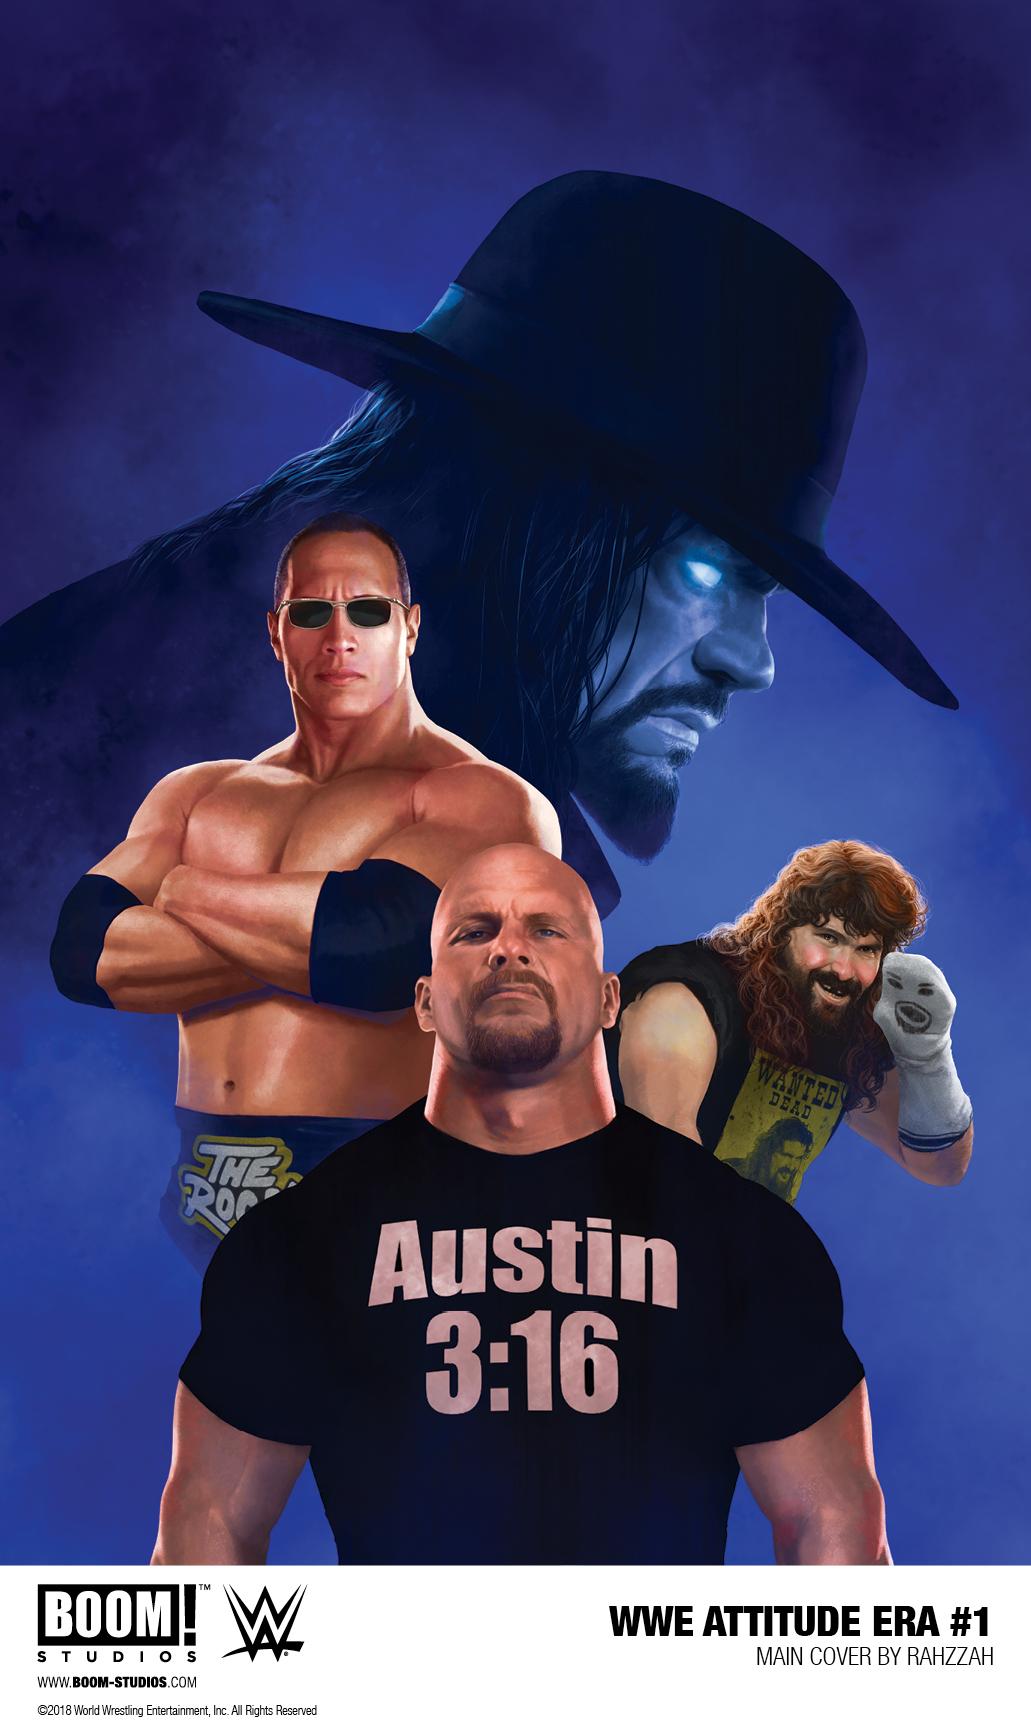 WWE_AttitudeEra_001_Main_PROMO.jpg